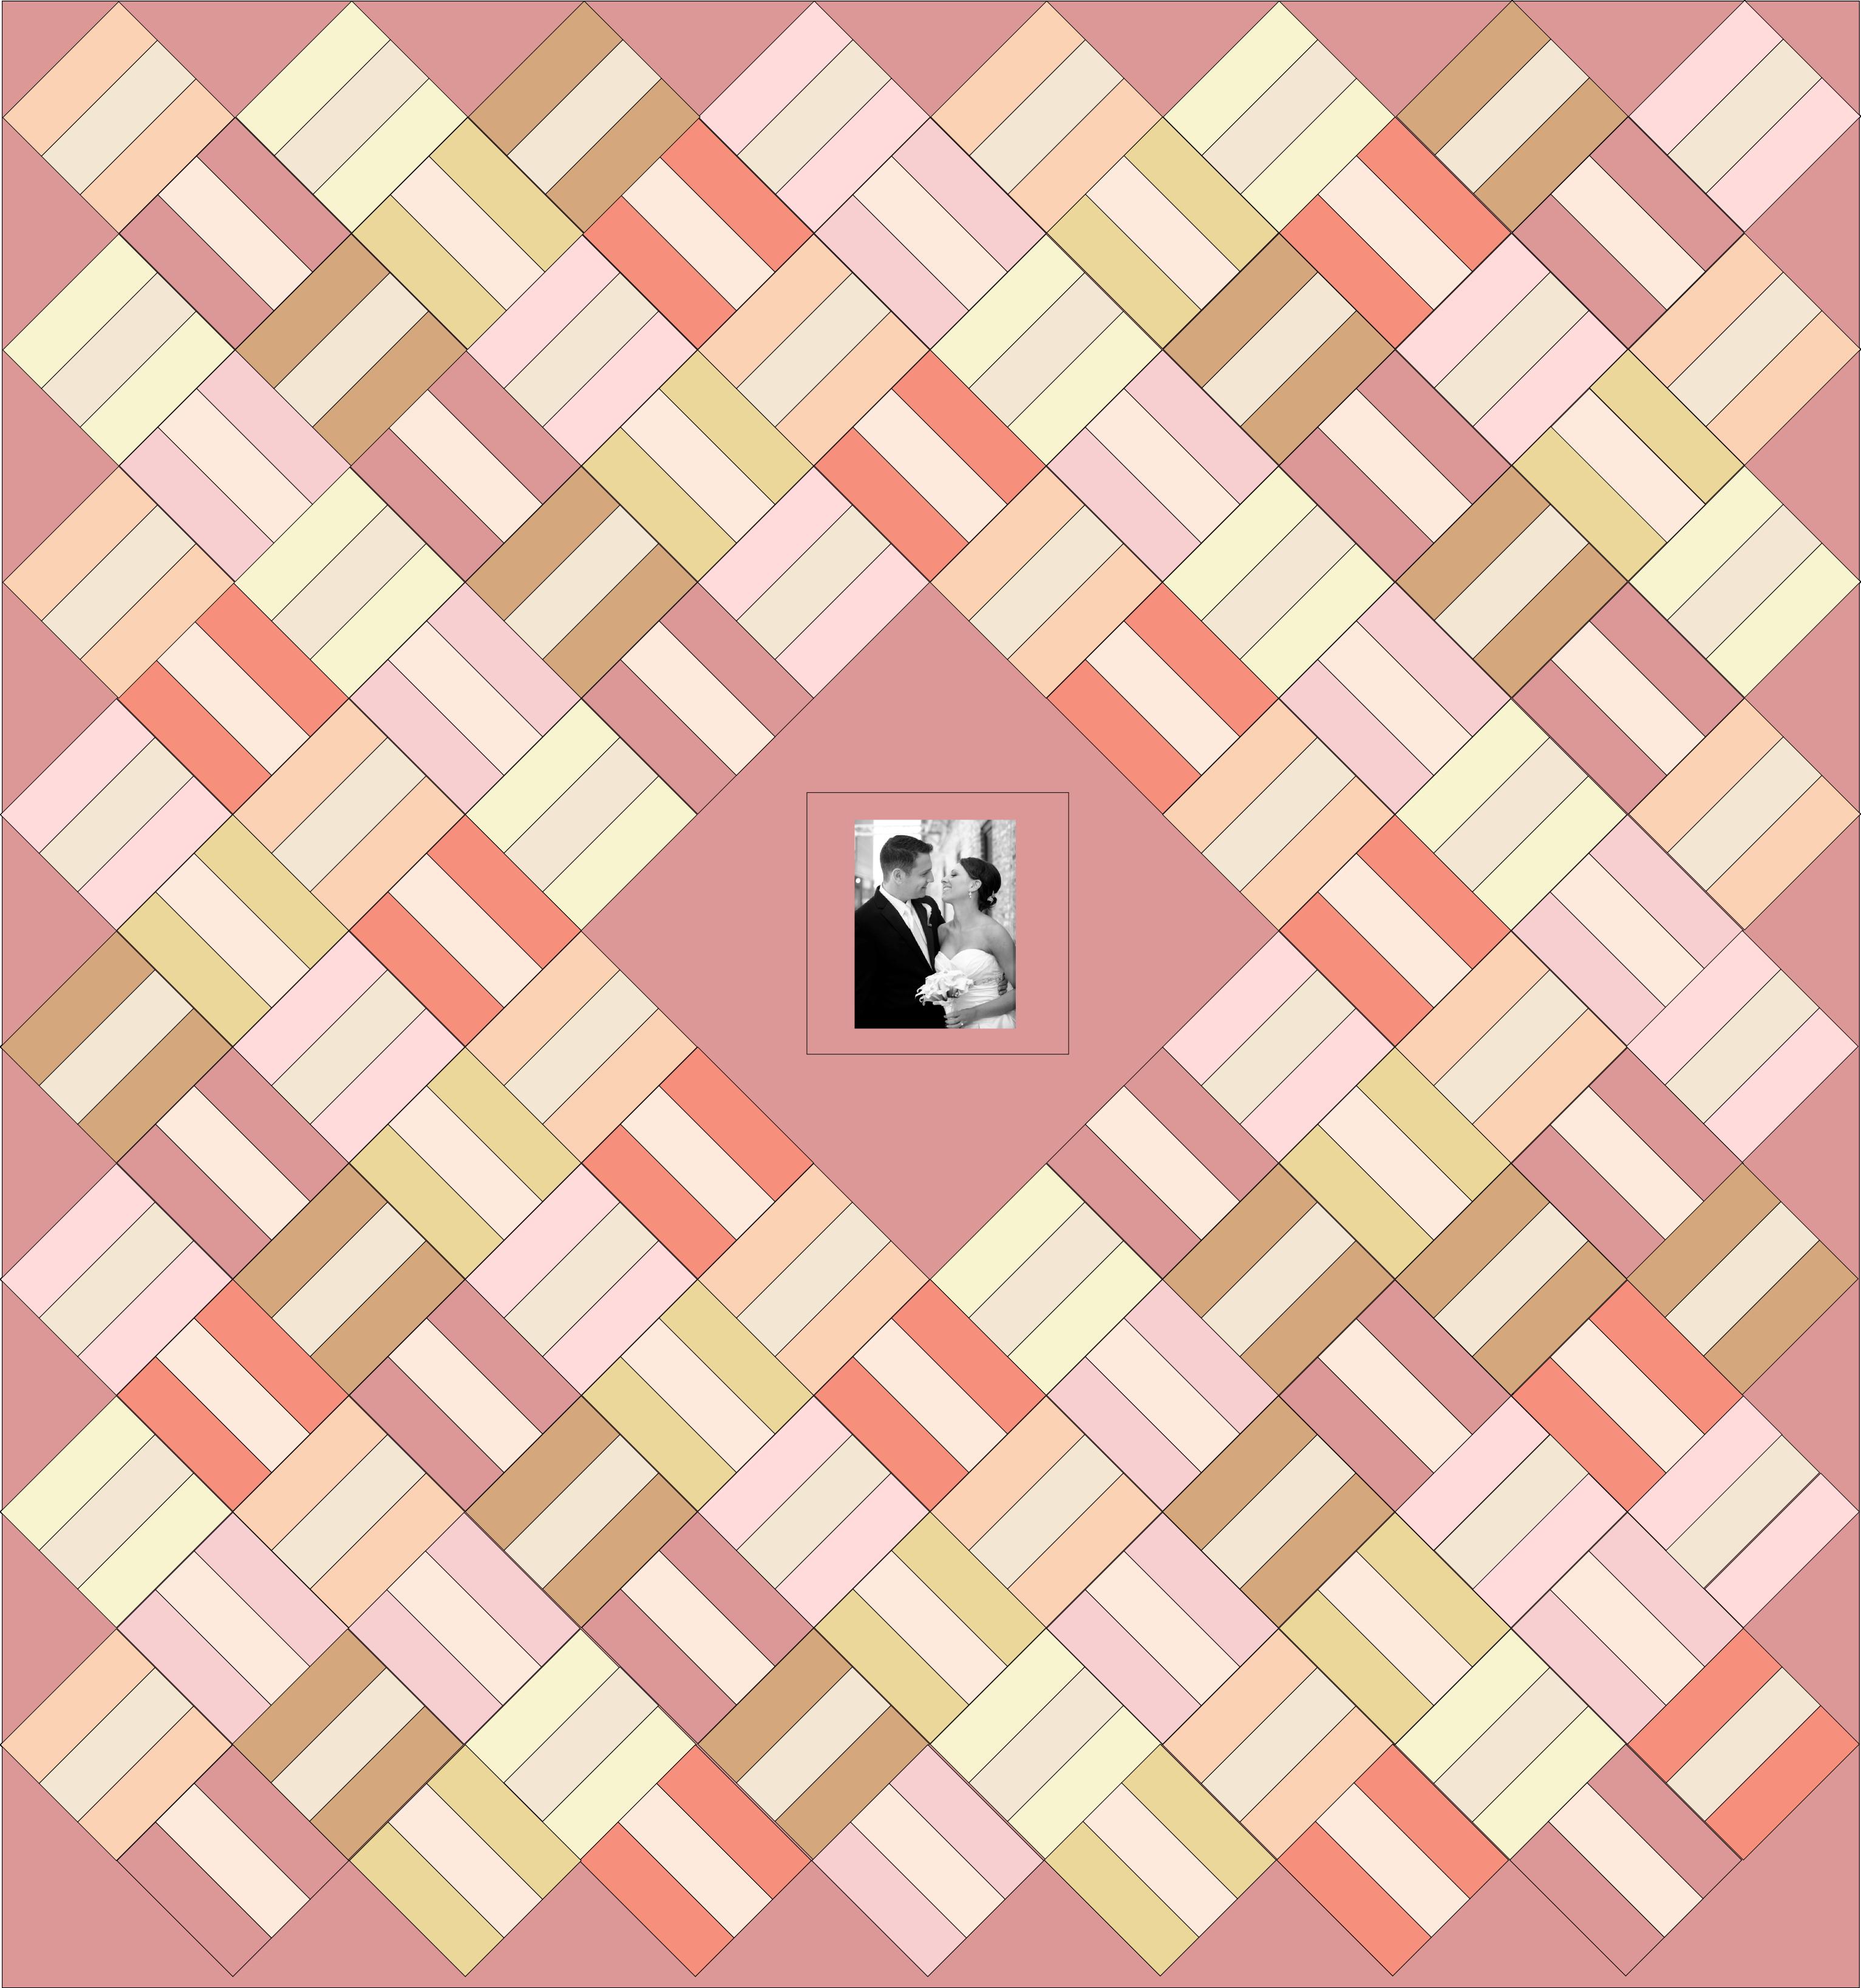 Book color palette - Pastel Wedding Color Palette Pink Brown Tan Wedding Quilt Guest Book Quilt Layout Inkscape Rail Fence